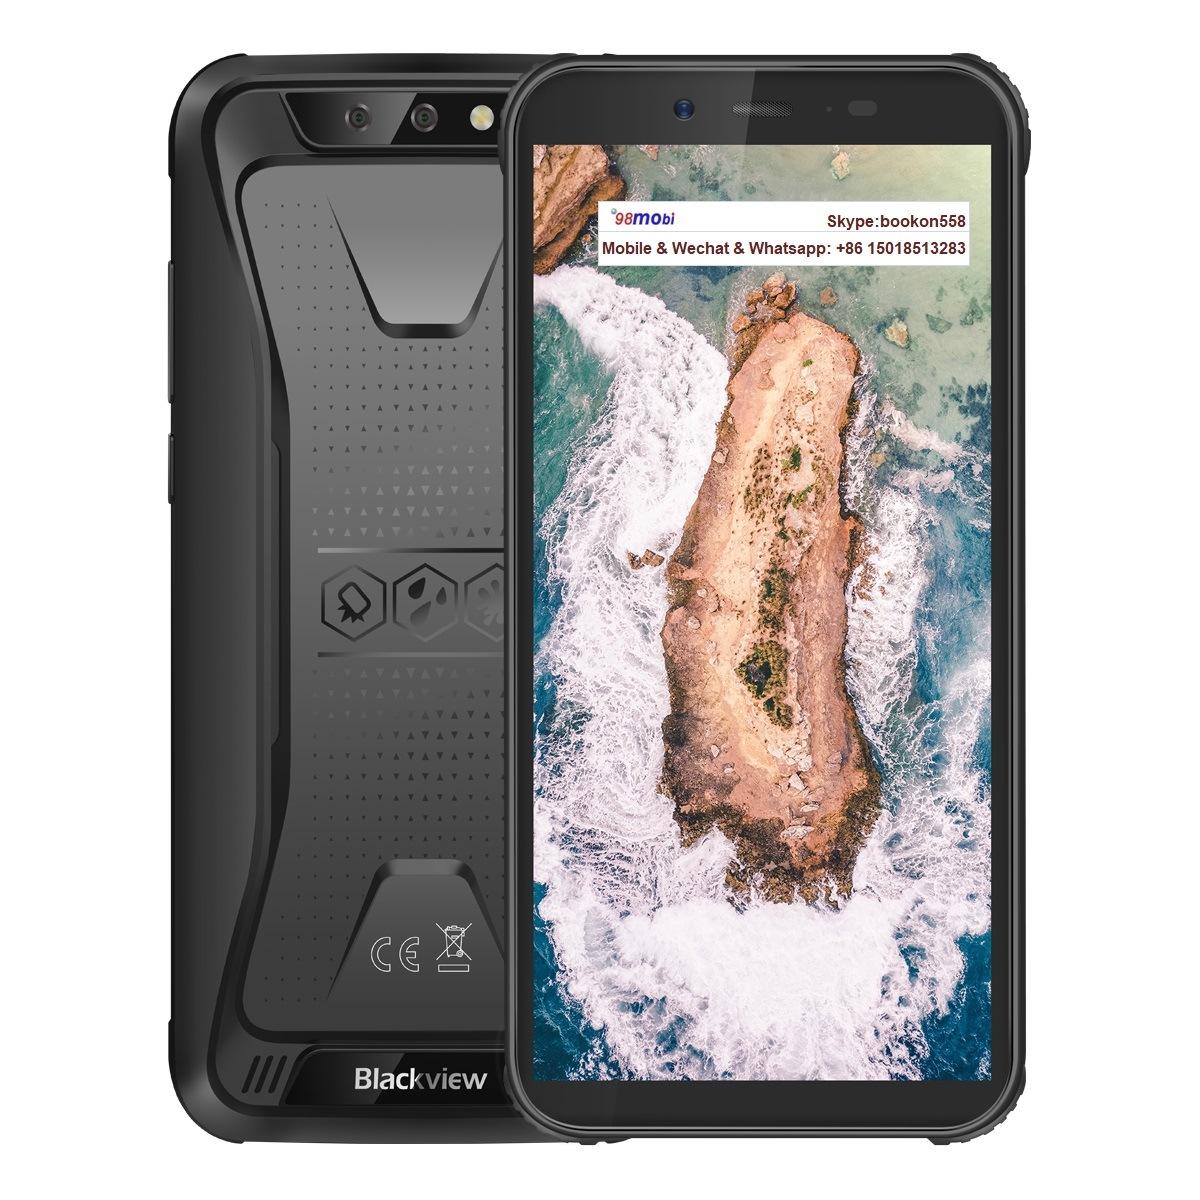 Hot Item Blackview Bv5500 Ip68 Waterproof Rugged Smartphone 5 4400mah Smart Phone